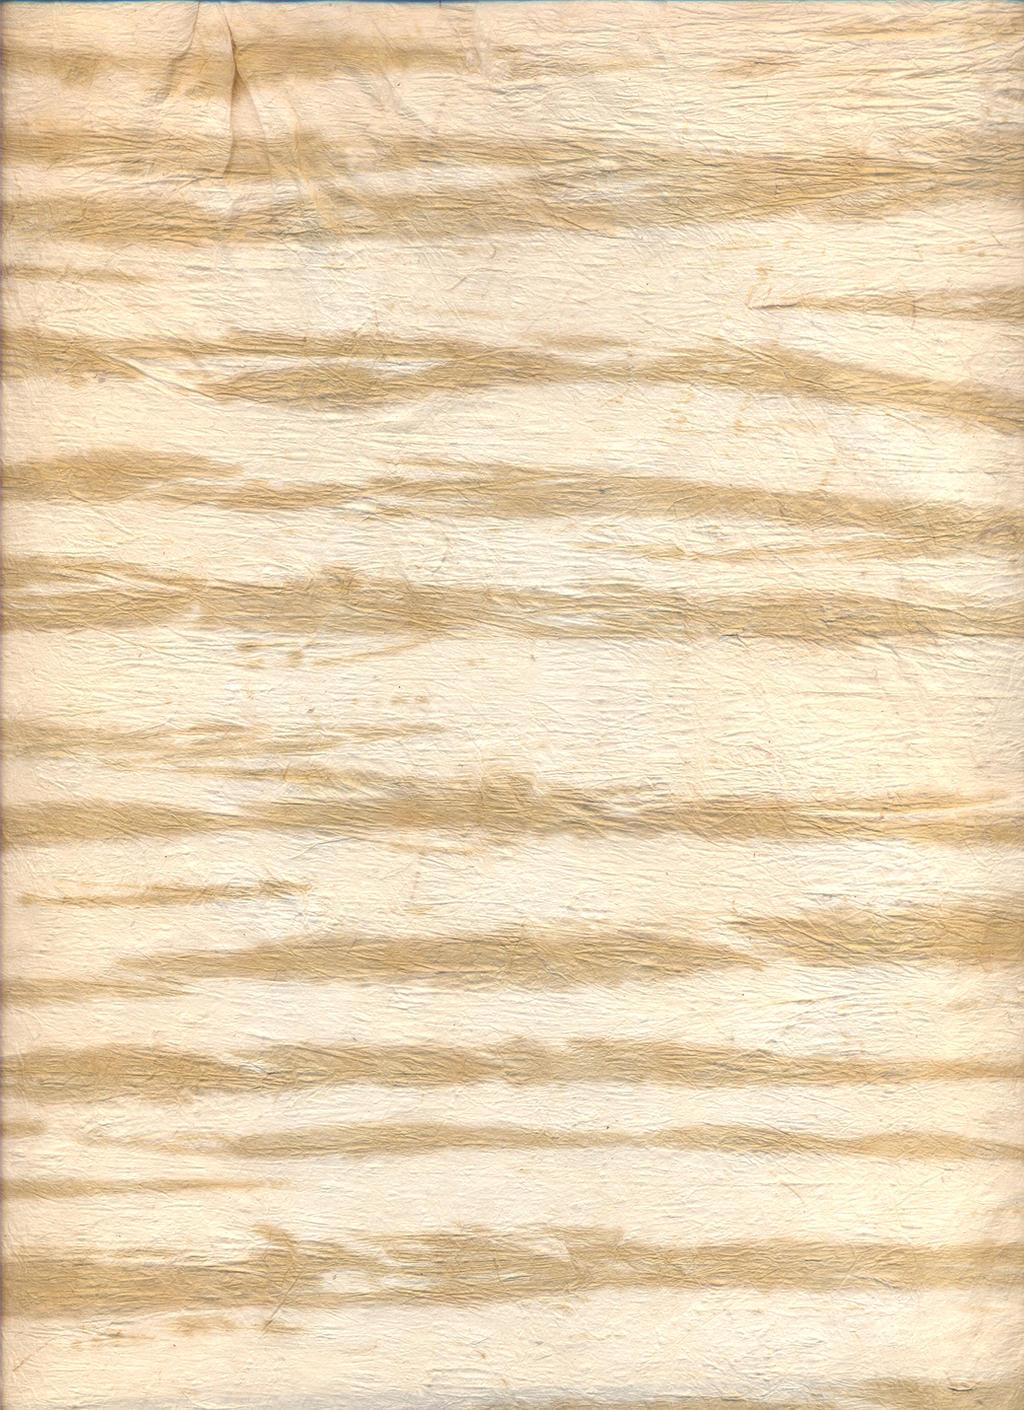 Free Paper 8 by Tsabo6